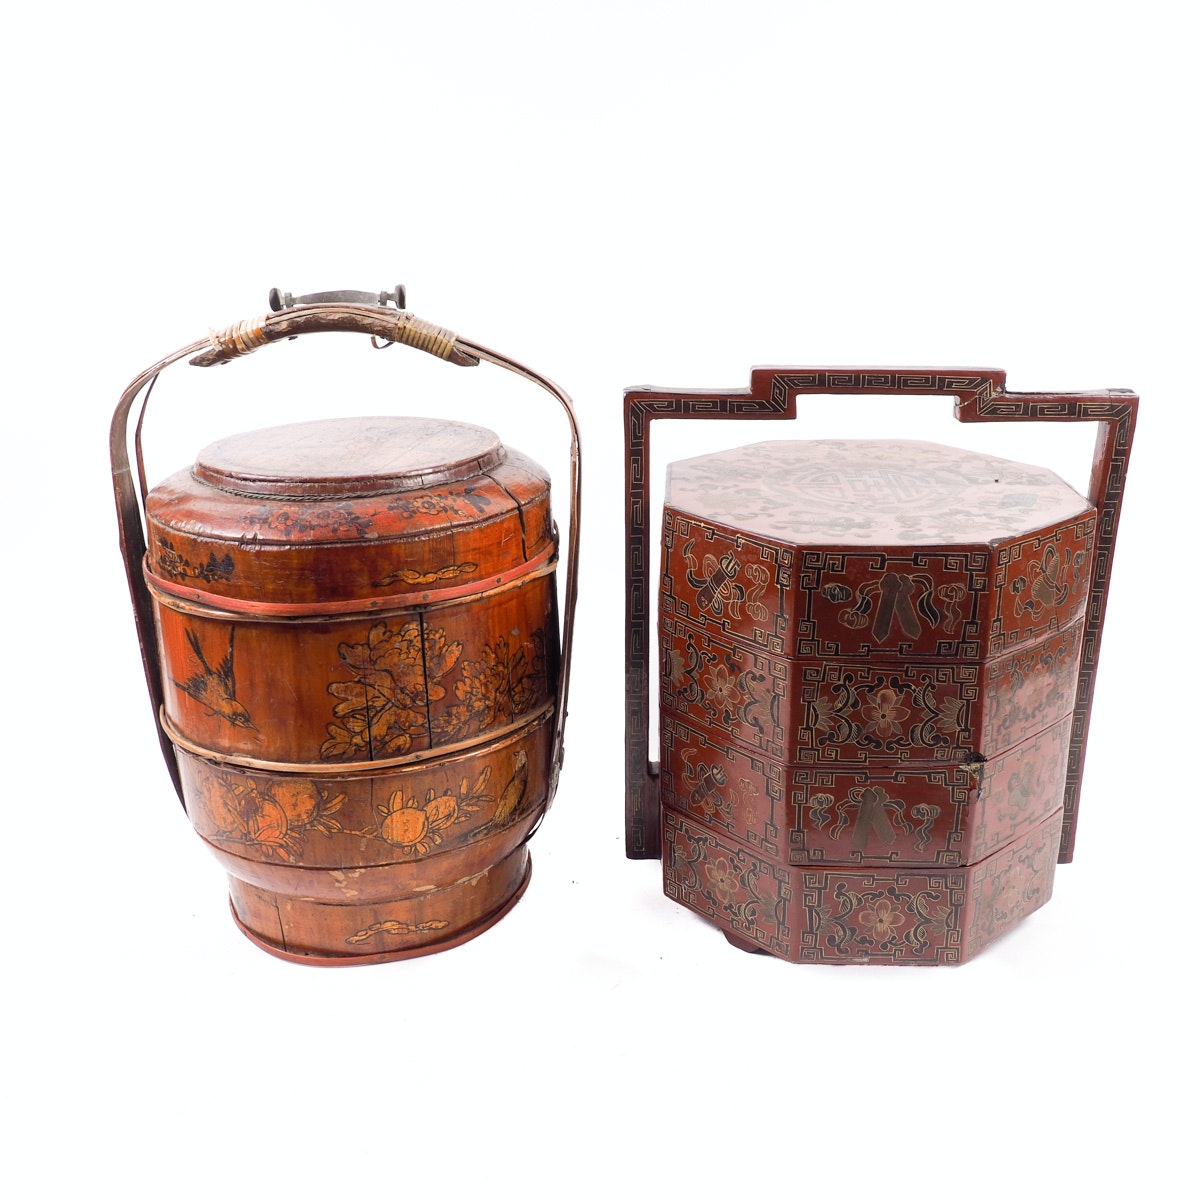 Vintage Chinese Wedding Baskets